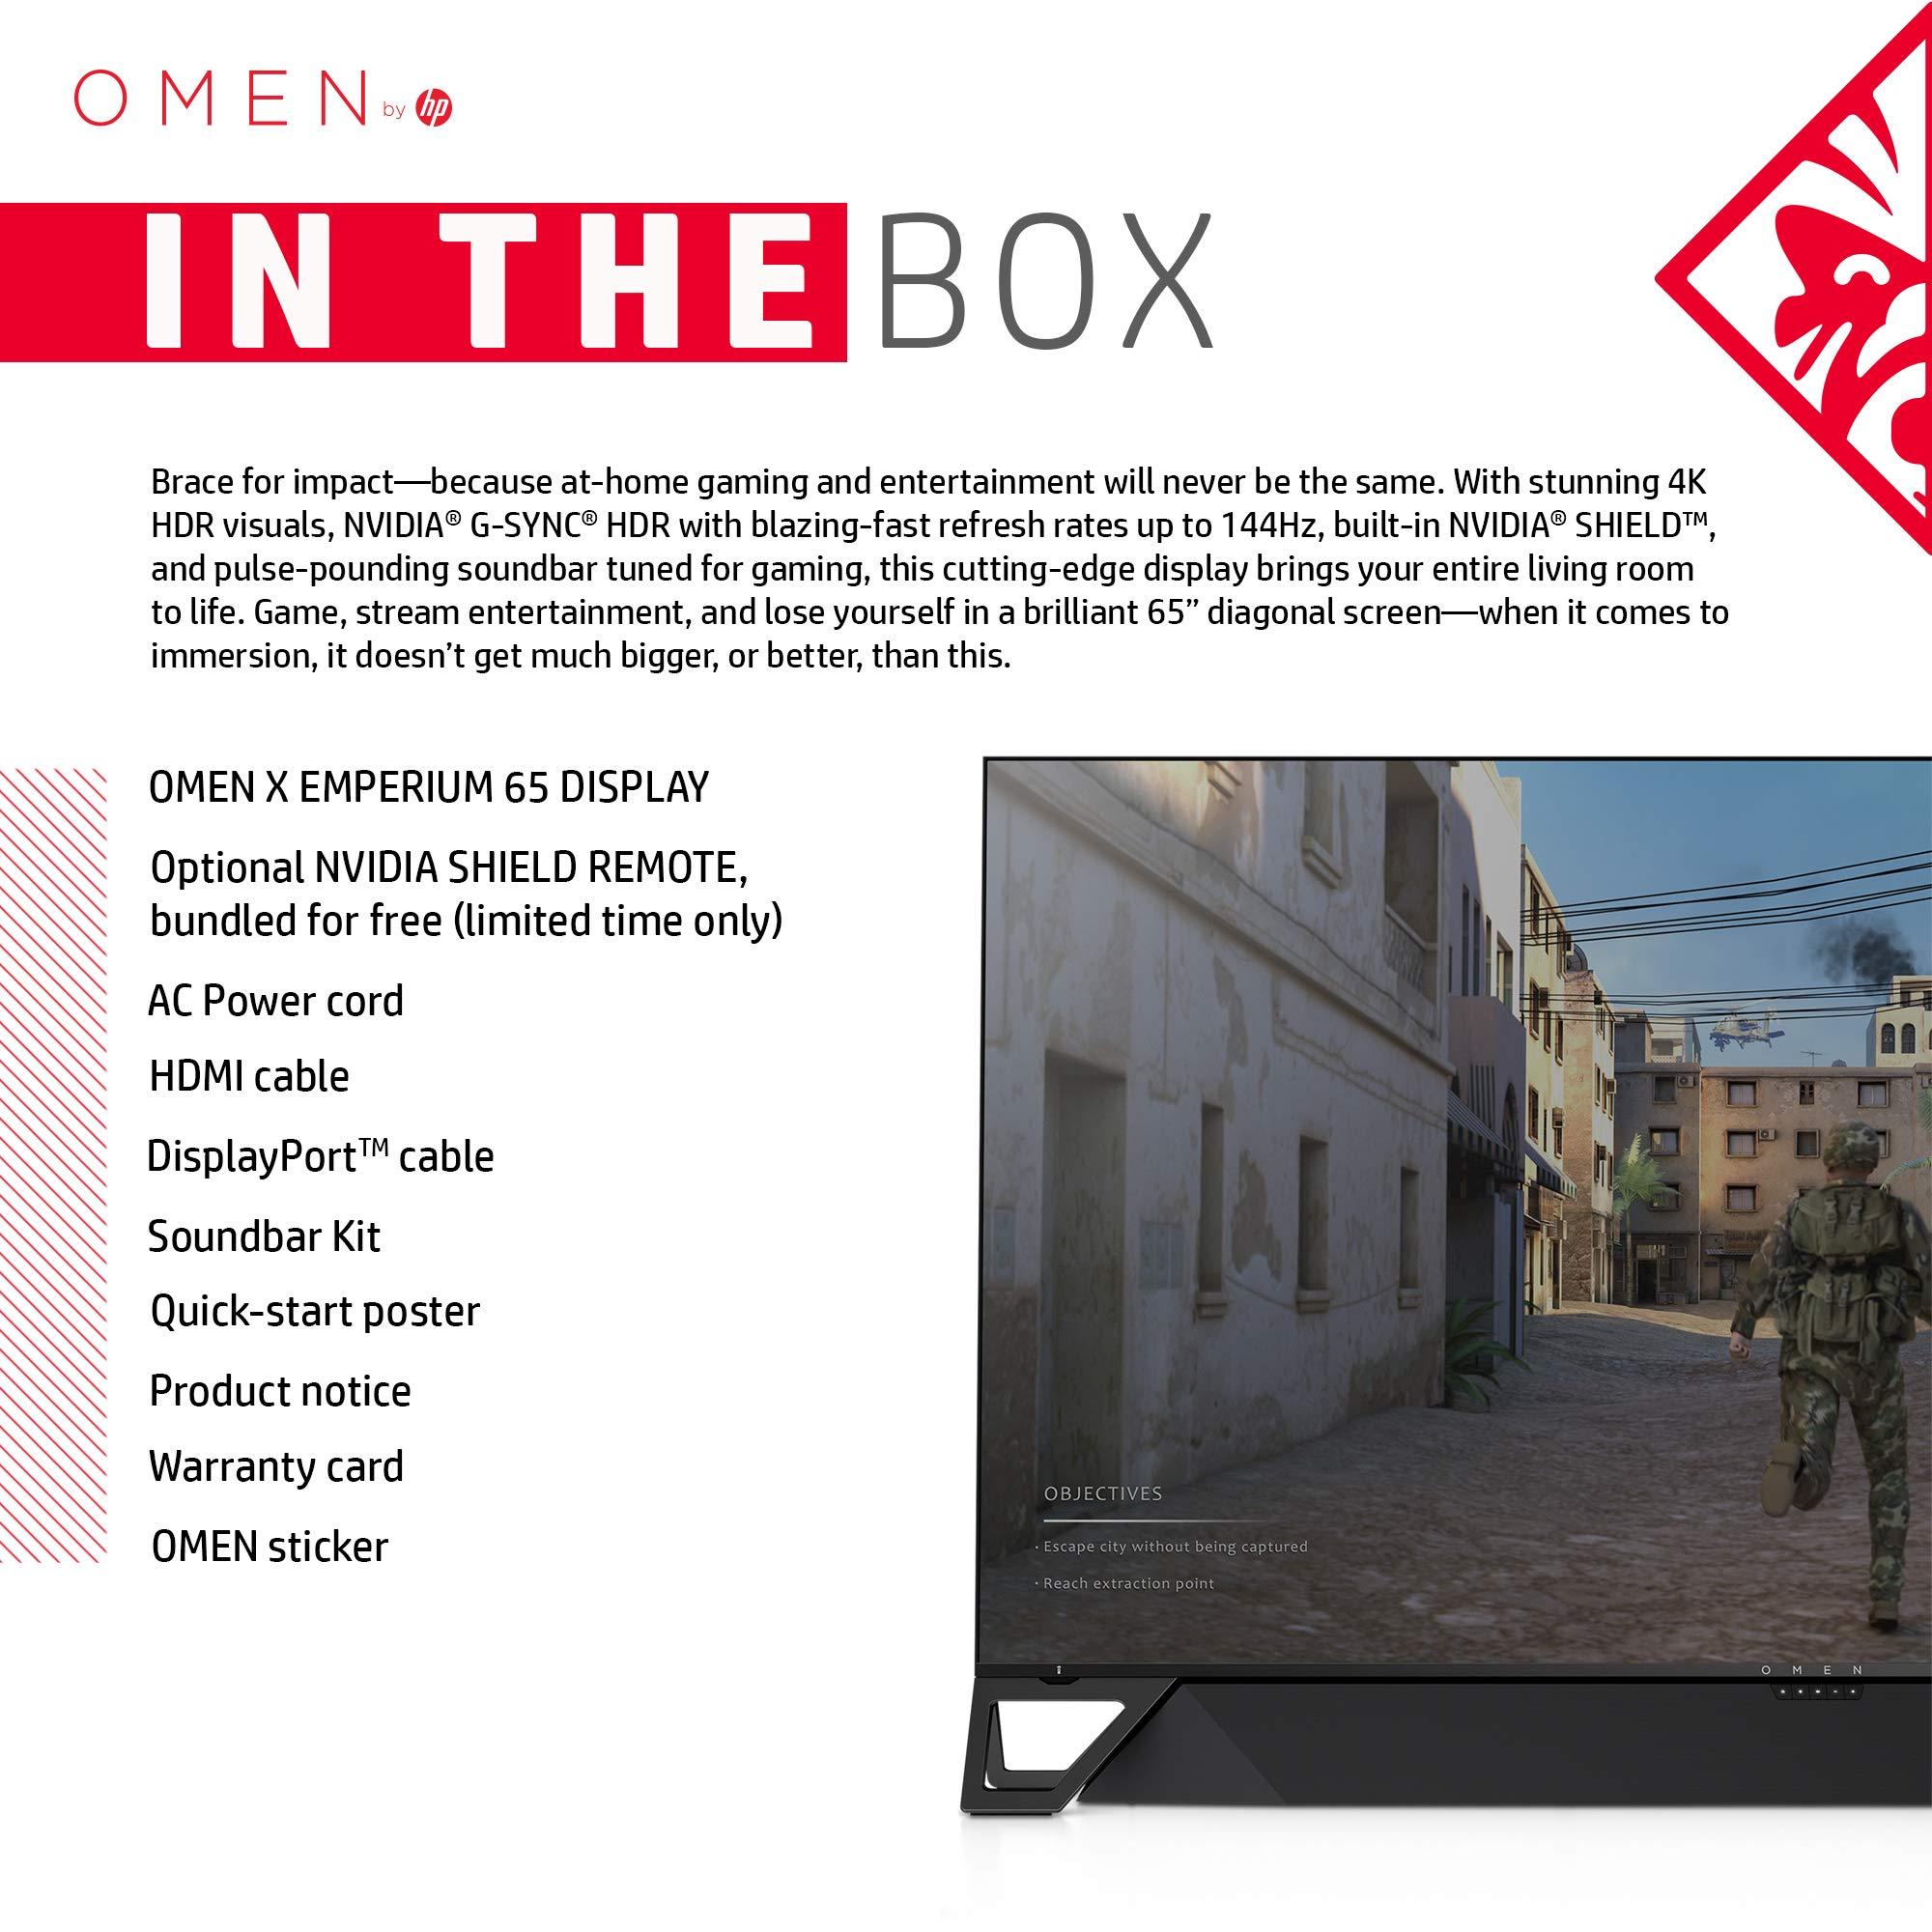 OMEN X by HP Emperium 65 inch 4K Big Format Gaming Display